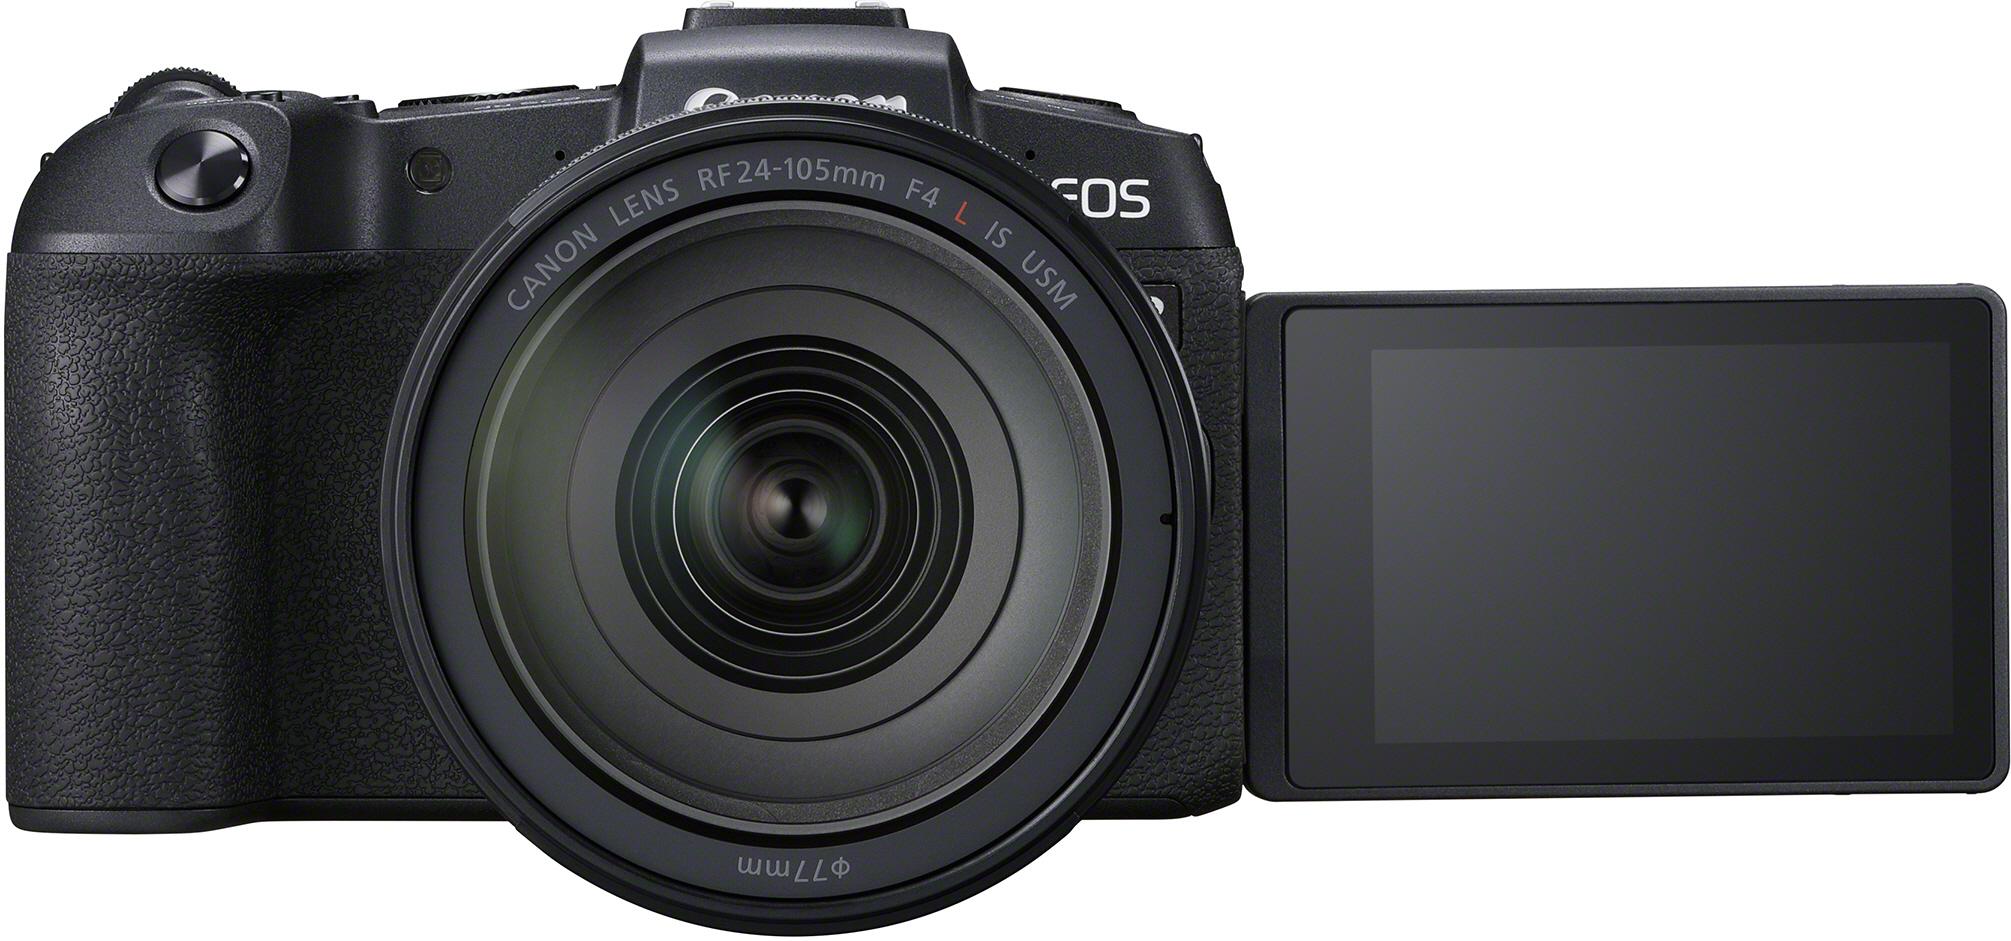 The best Canon EOS RP deals